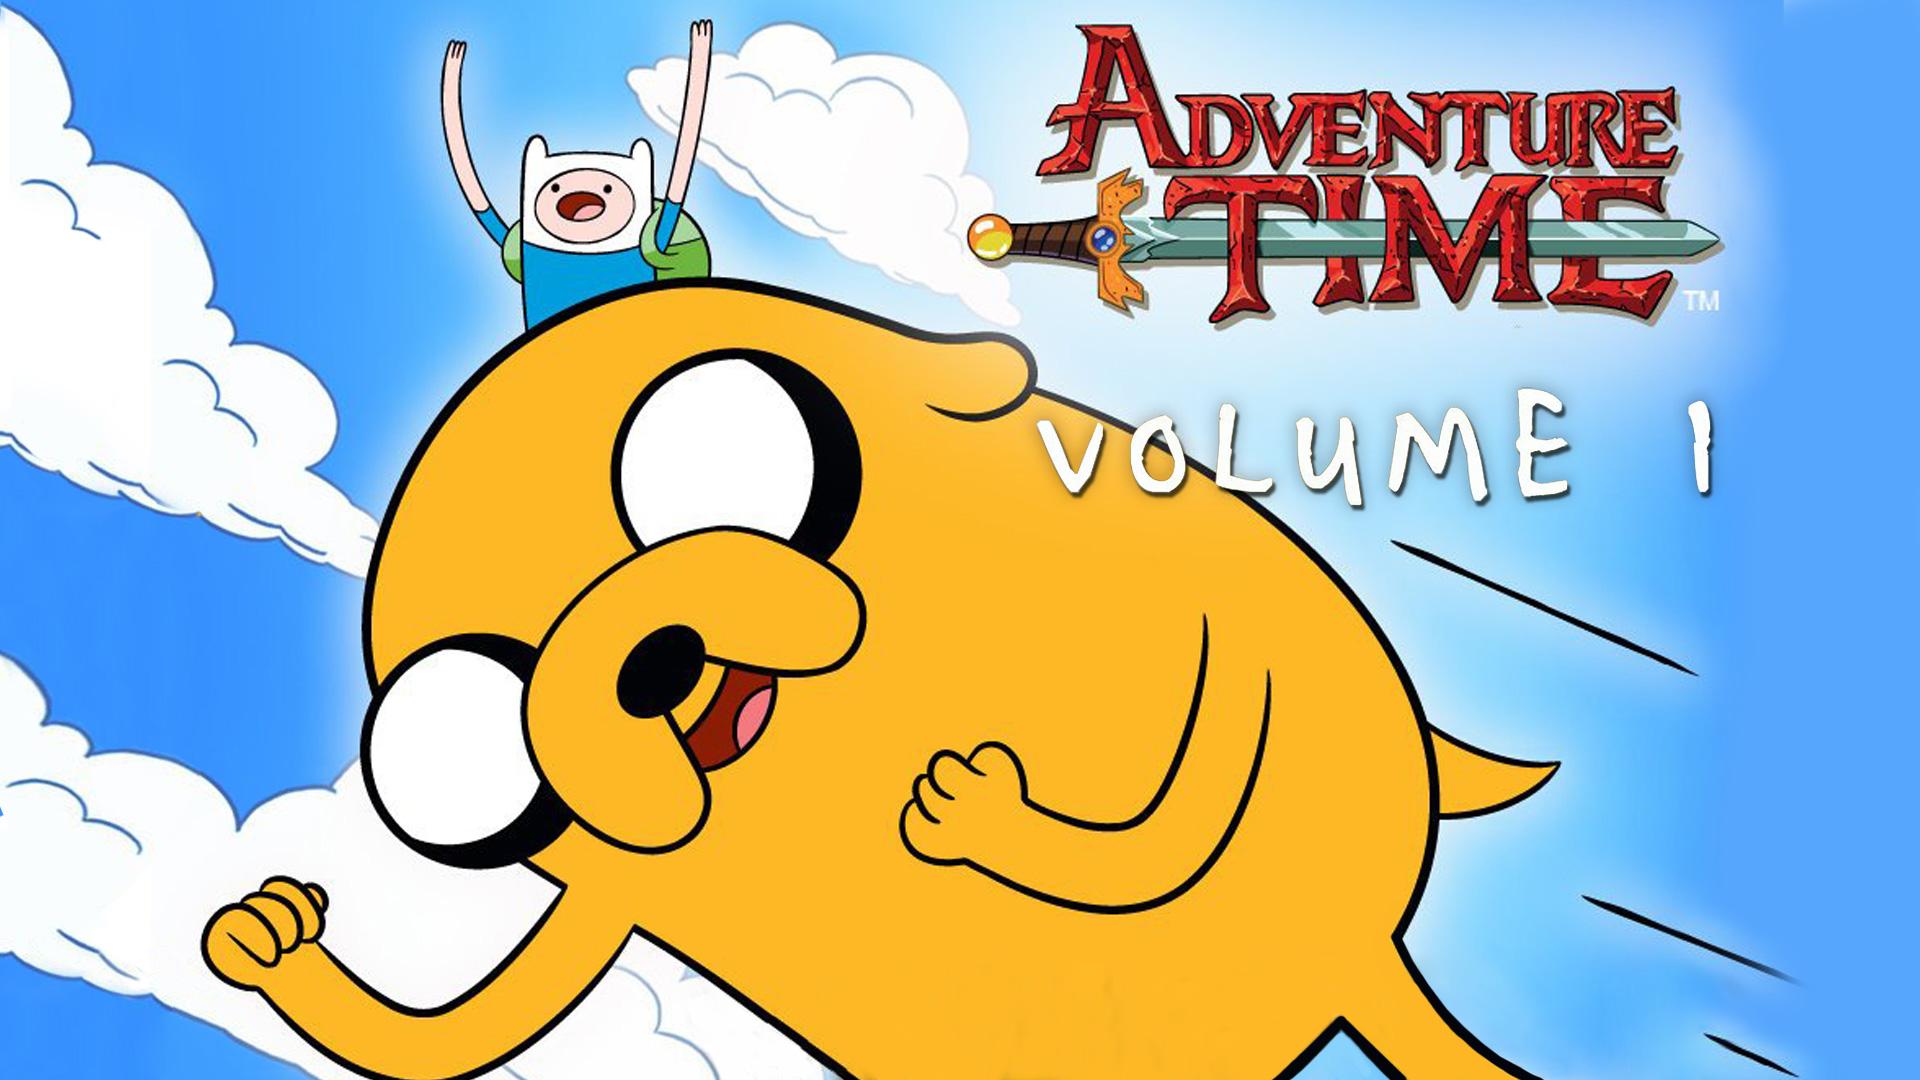 Adventure Time Volume 1